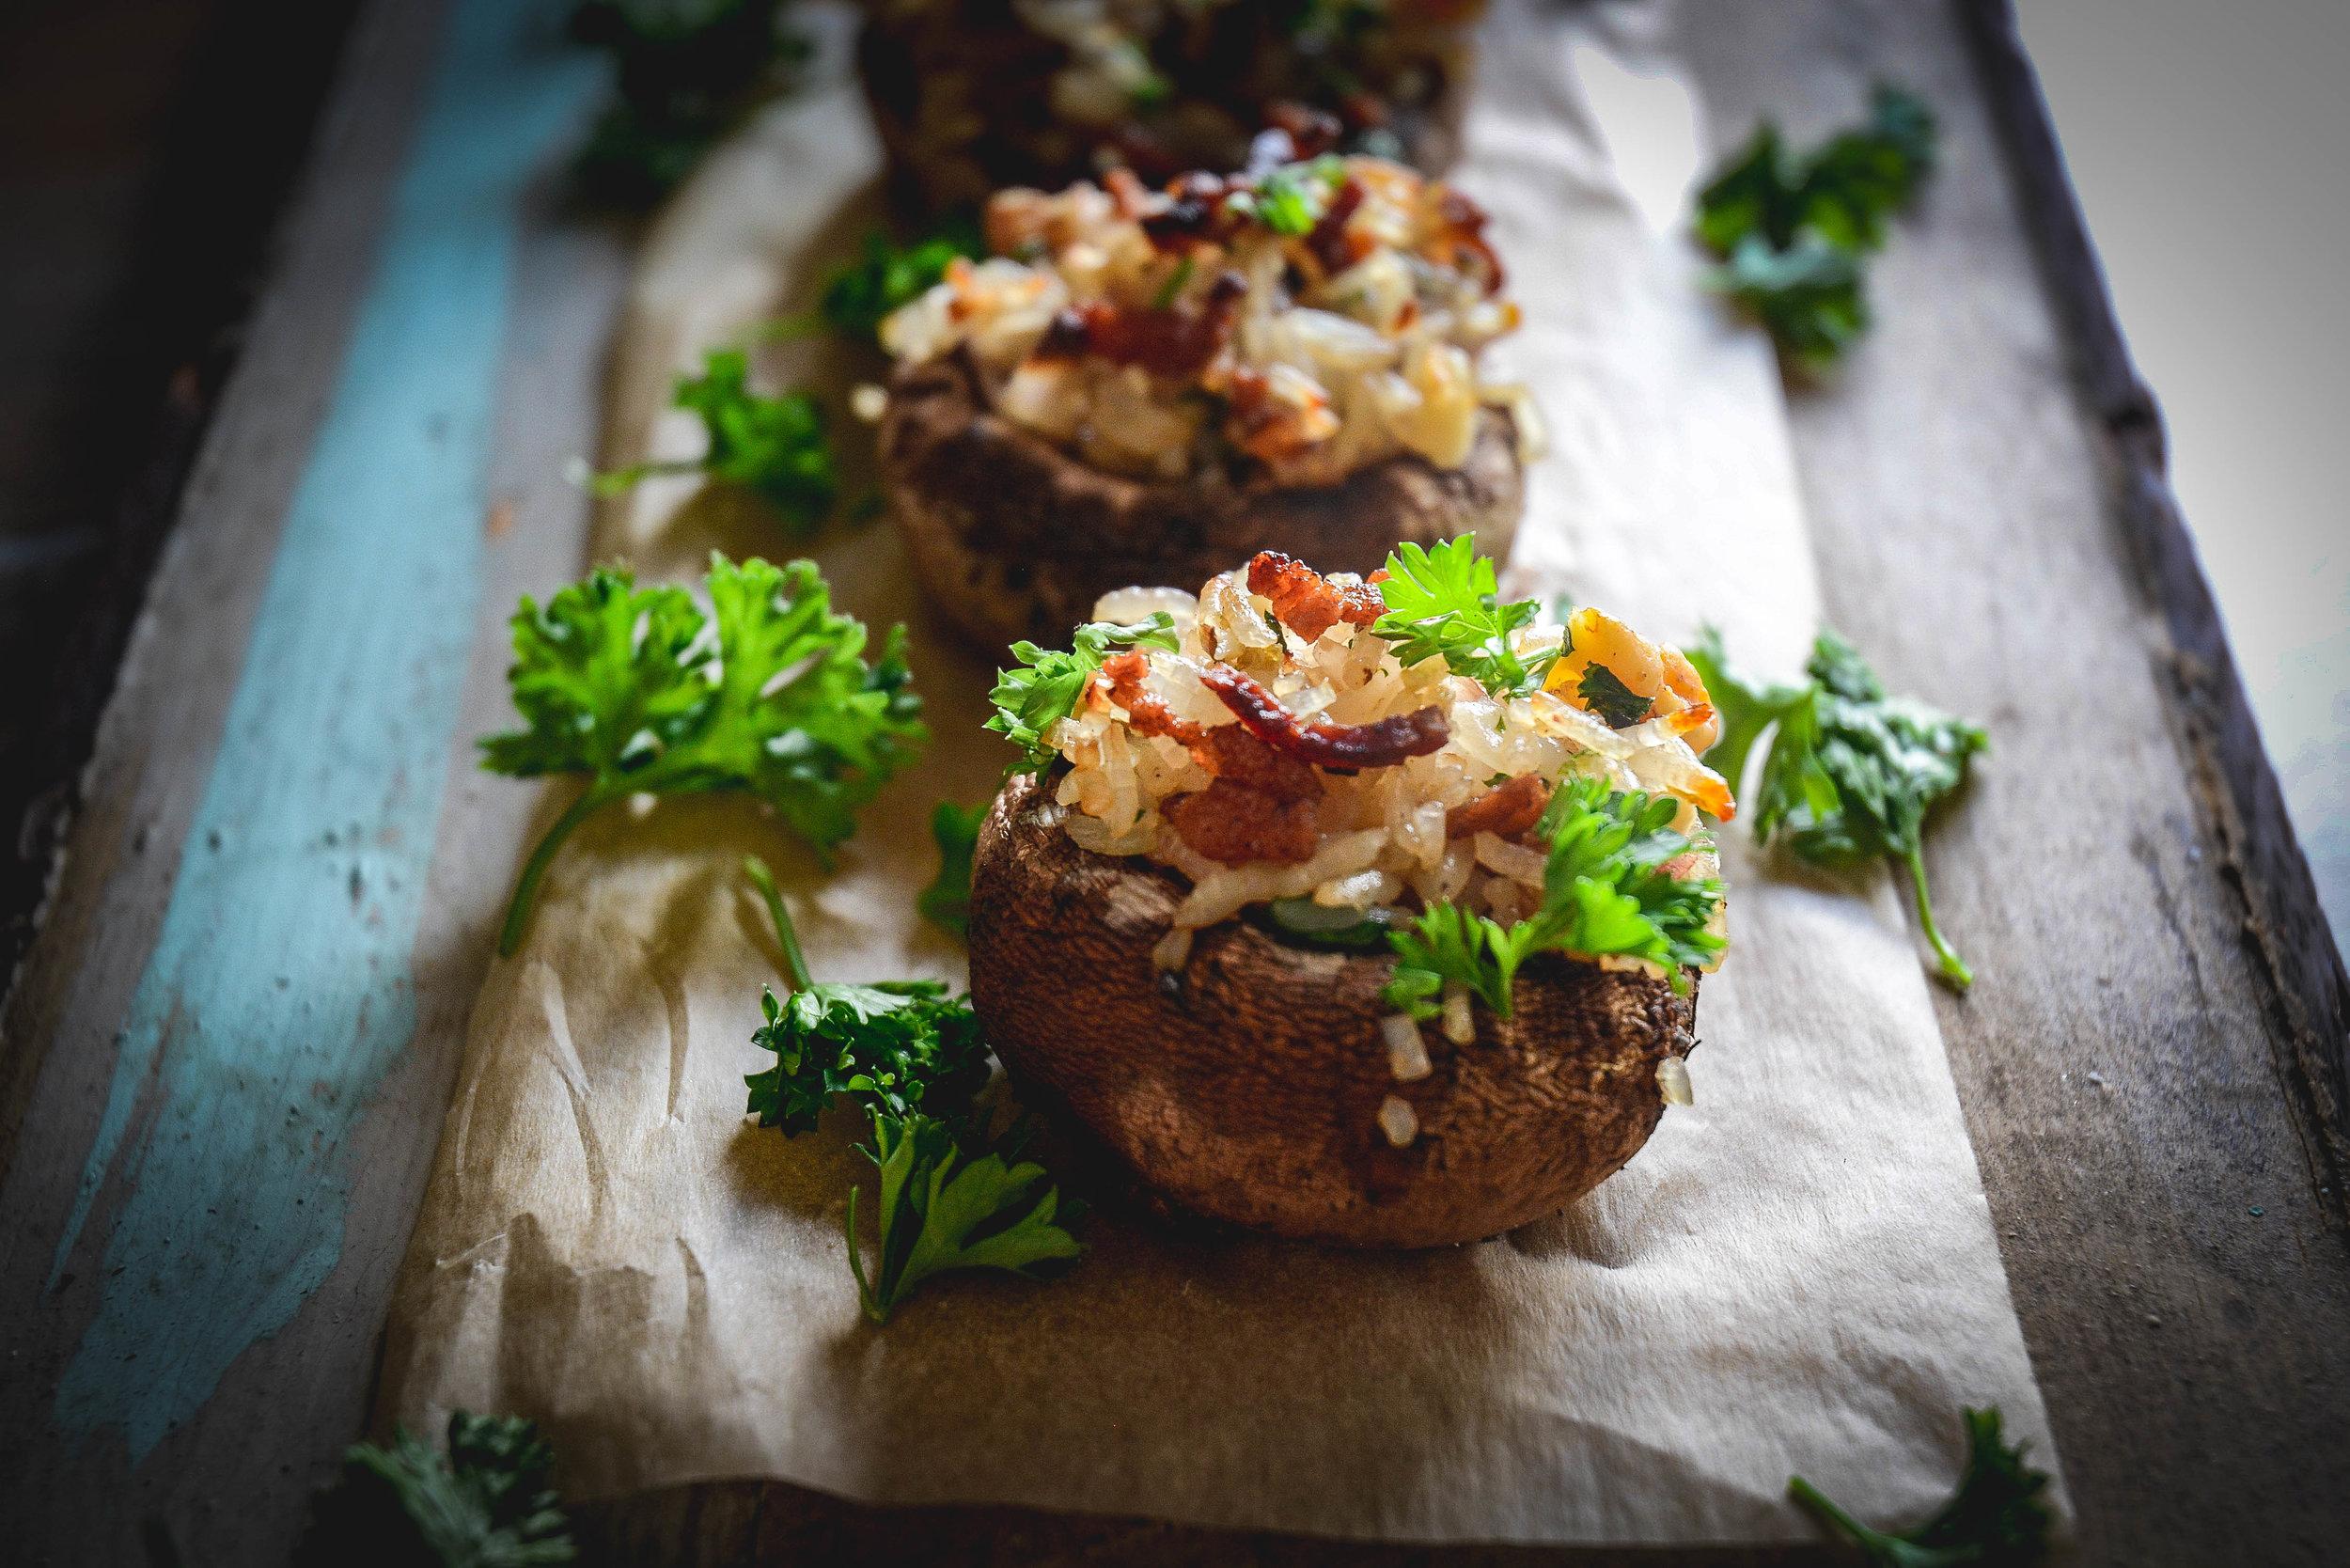 stuffed mushrooms on board with parsley